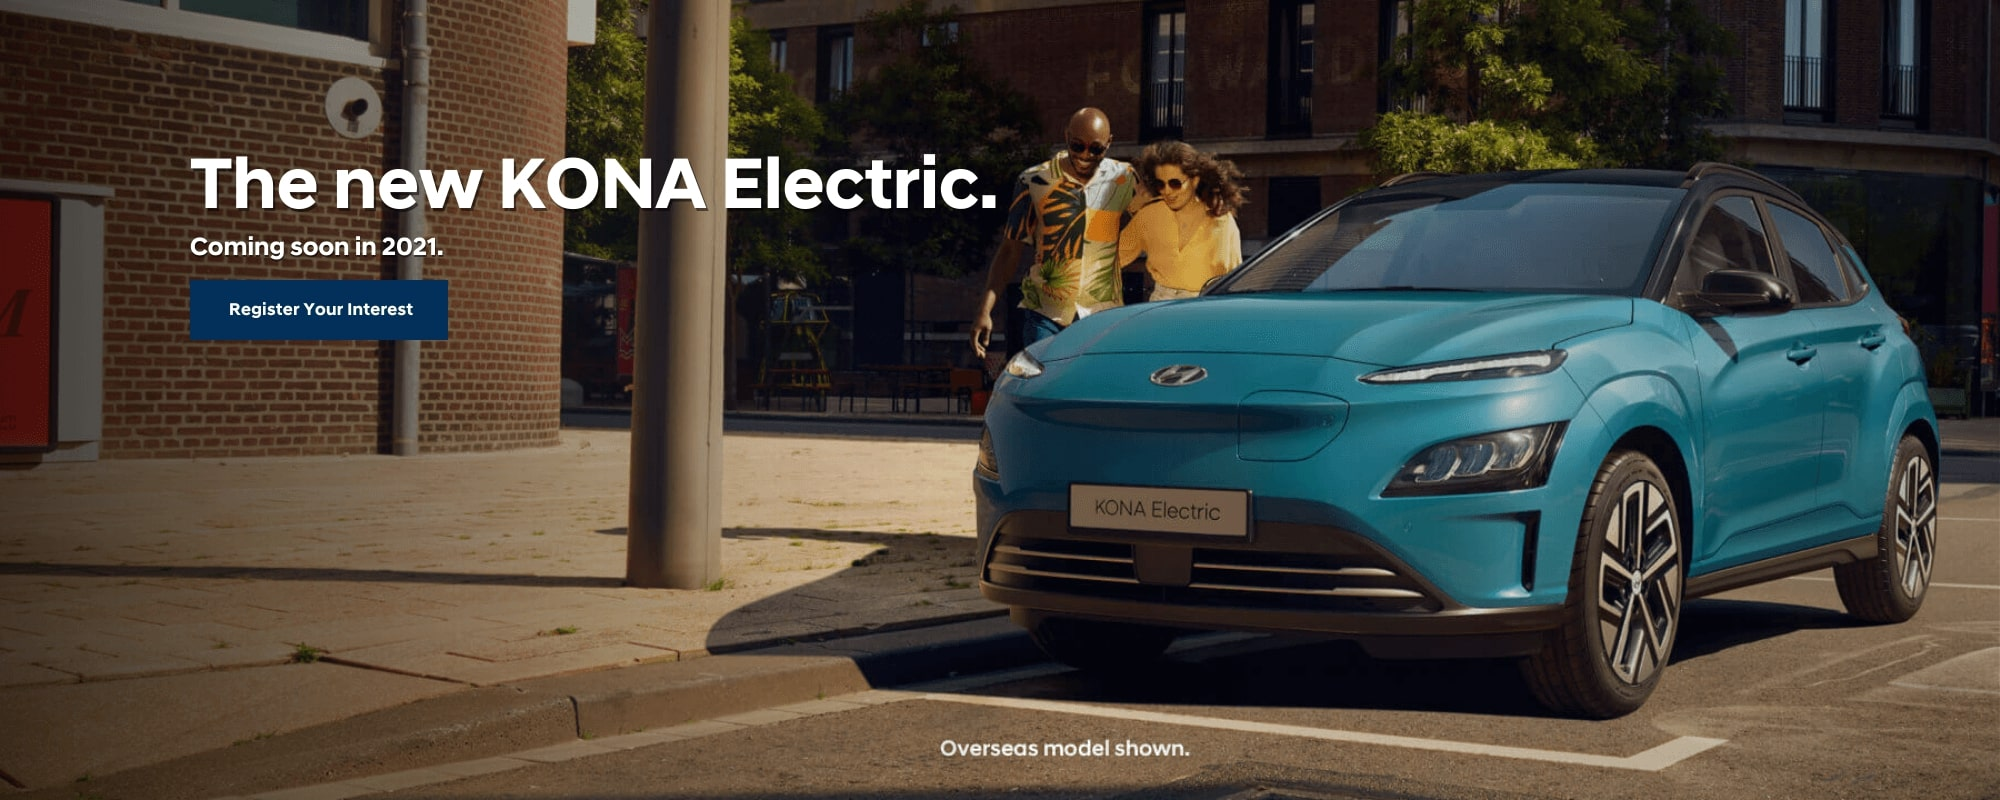 Coming Soon: Hyundai KONA EV. Zero Emissions. Powerful Performance. Electrifying Design.